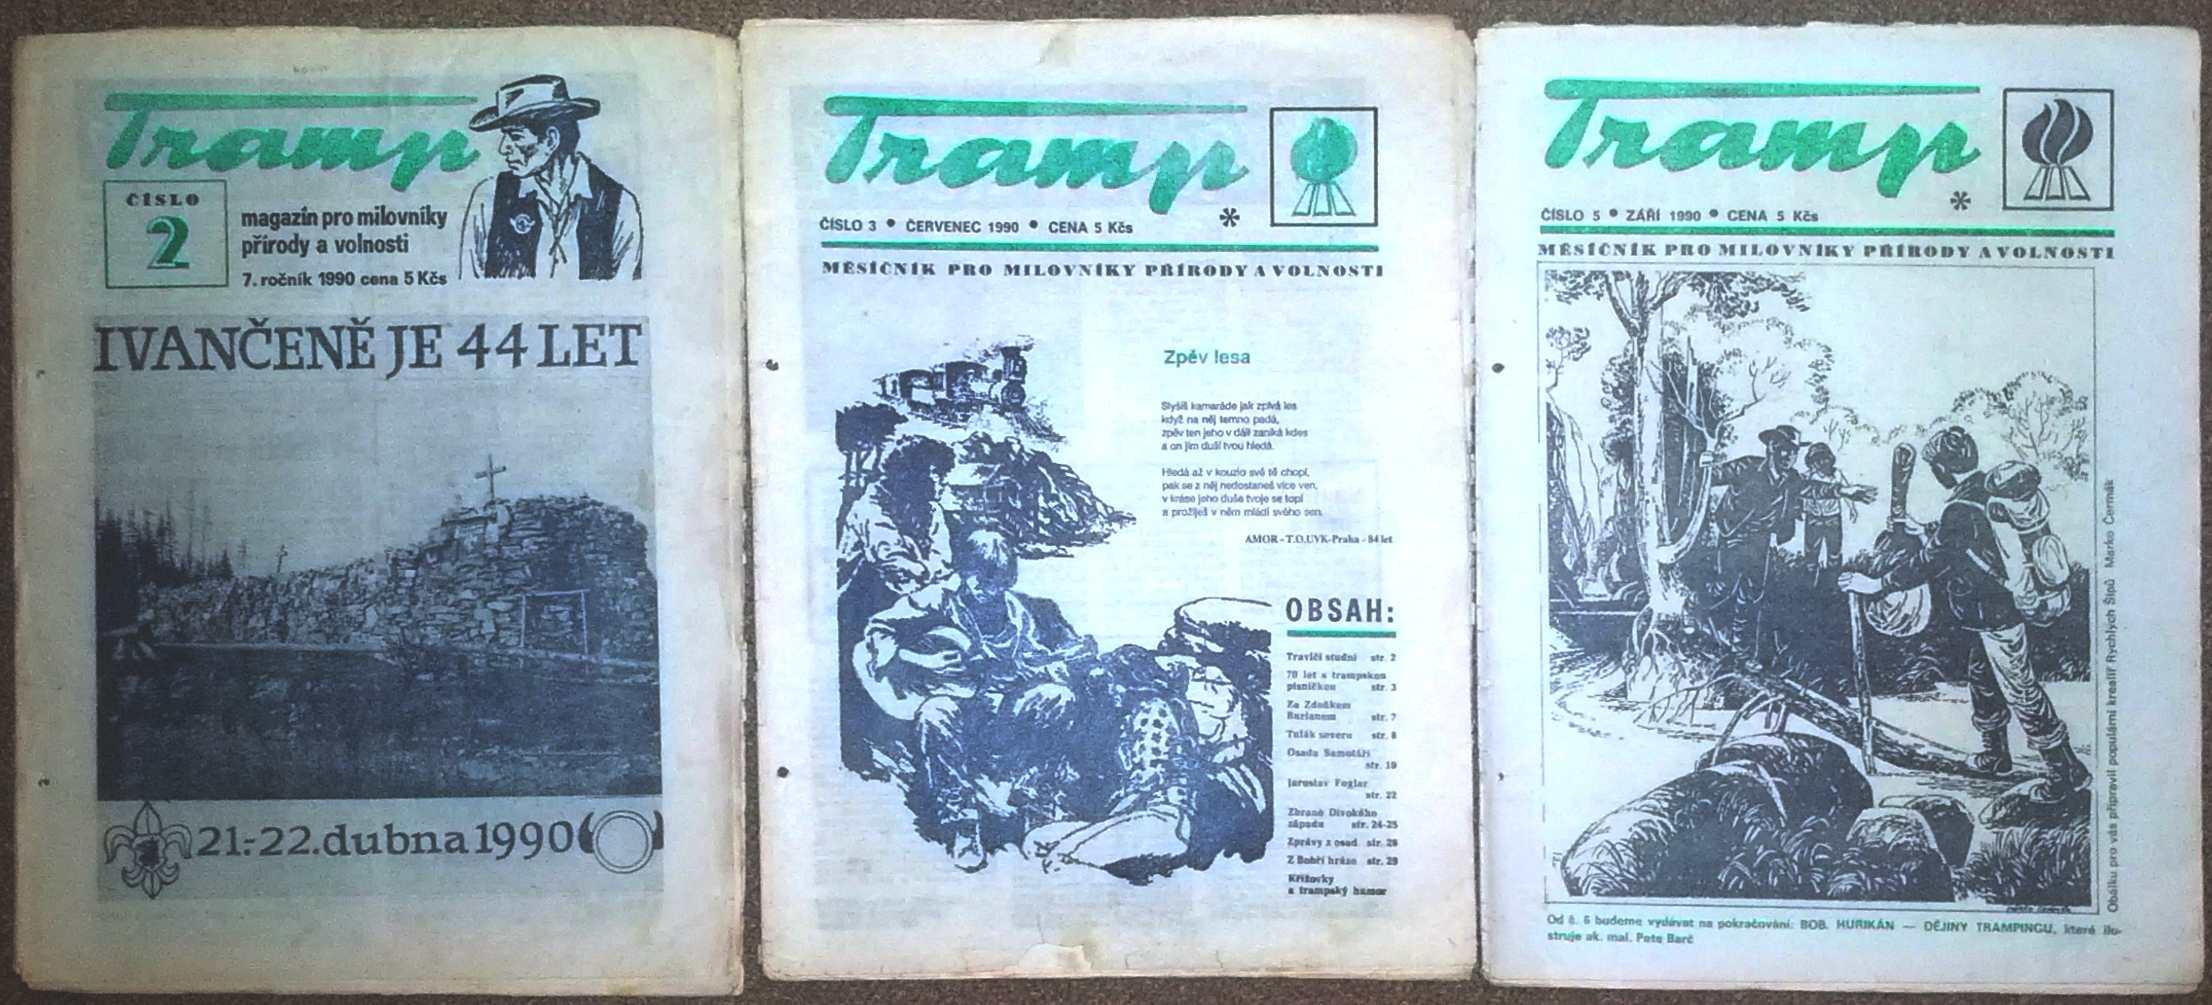 TRAMP_1990_020305